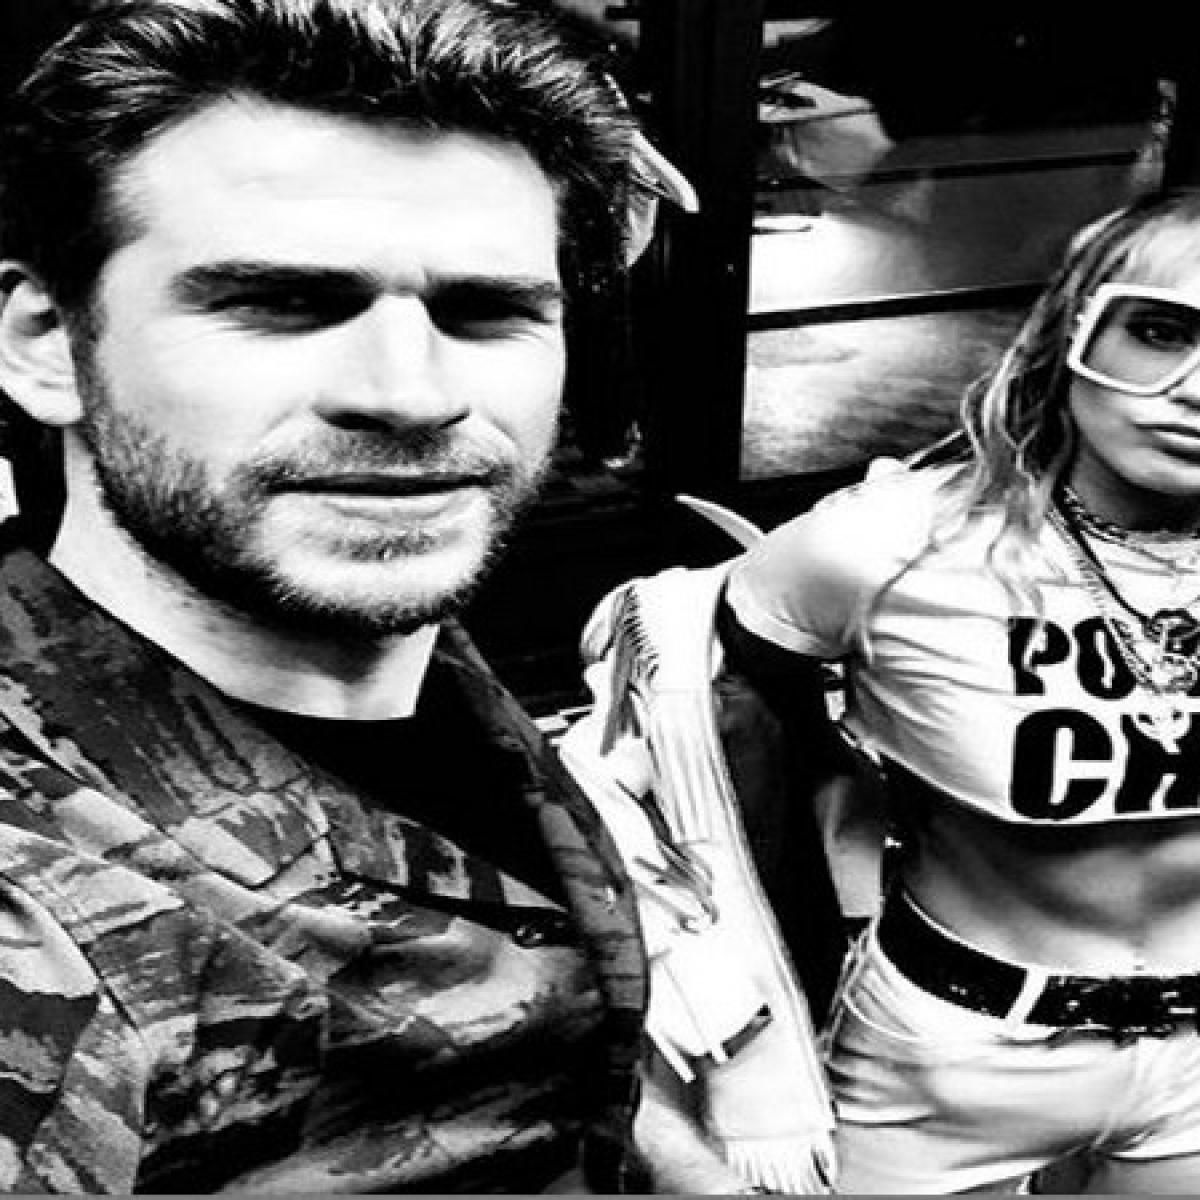 Miley Cyrus takes a jab at ex-husband Liam Hemsworth